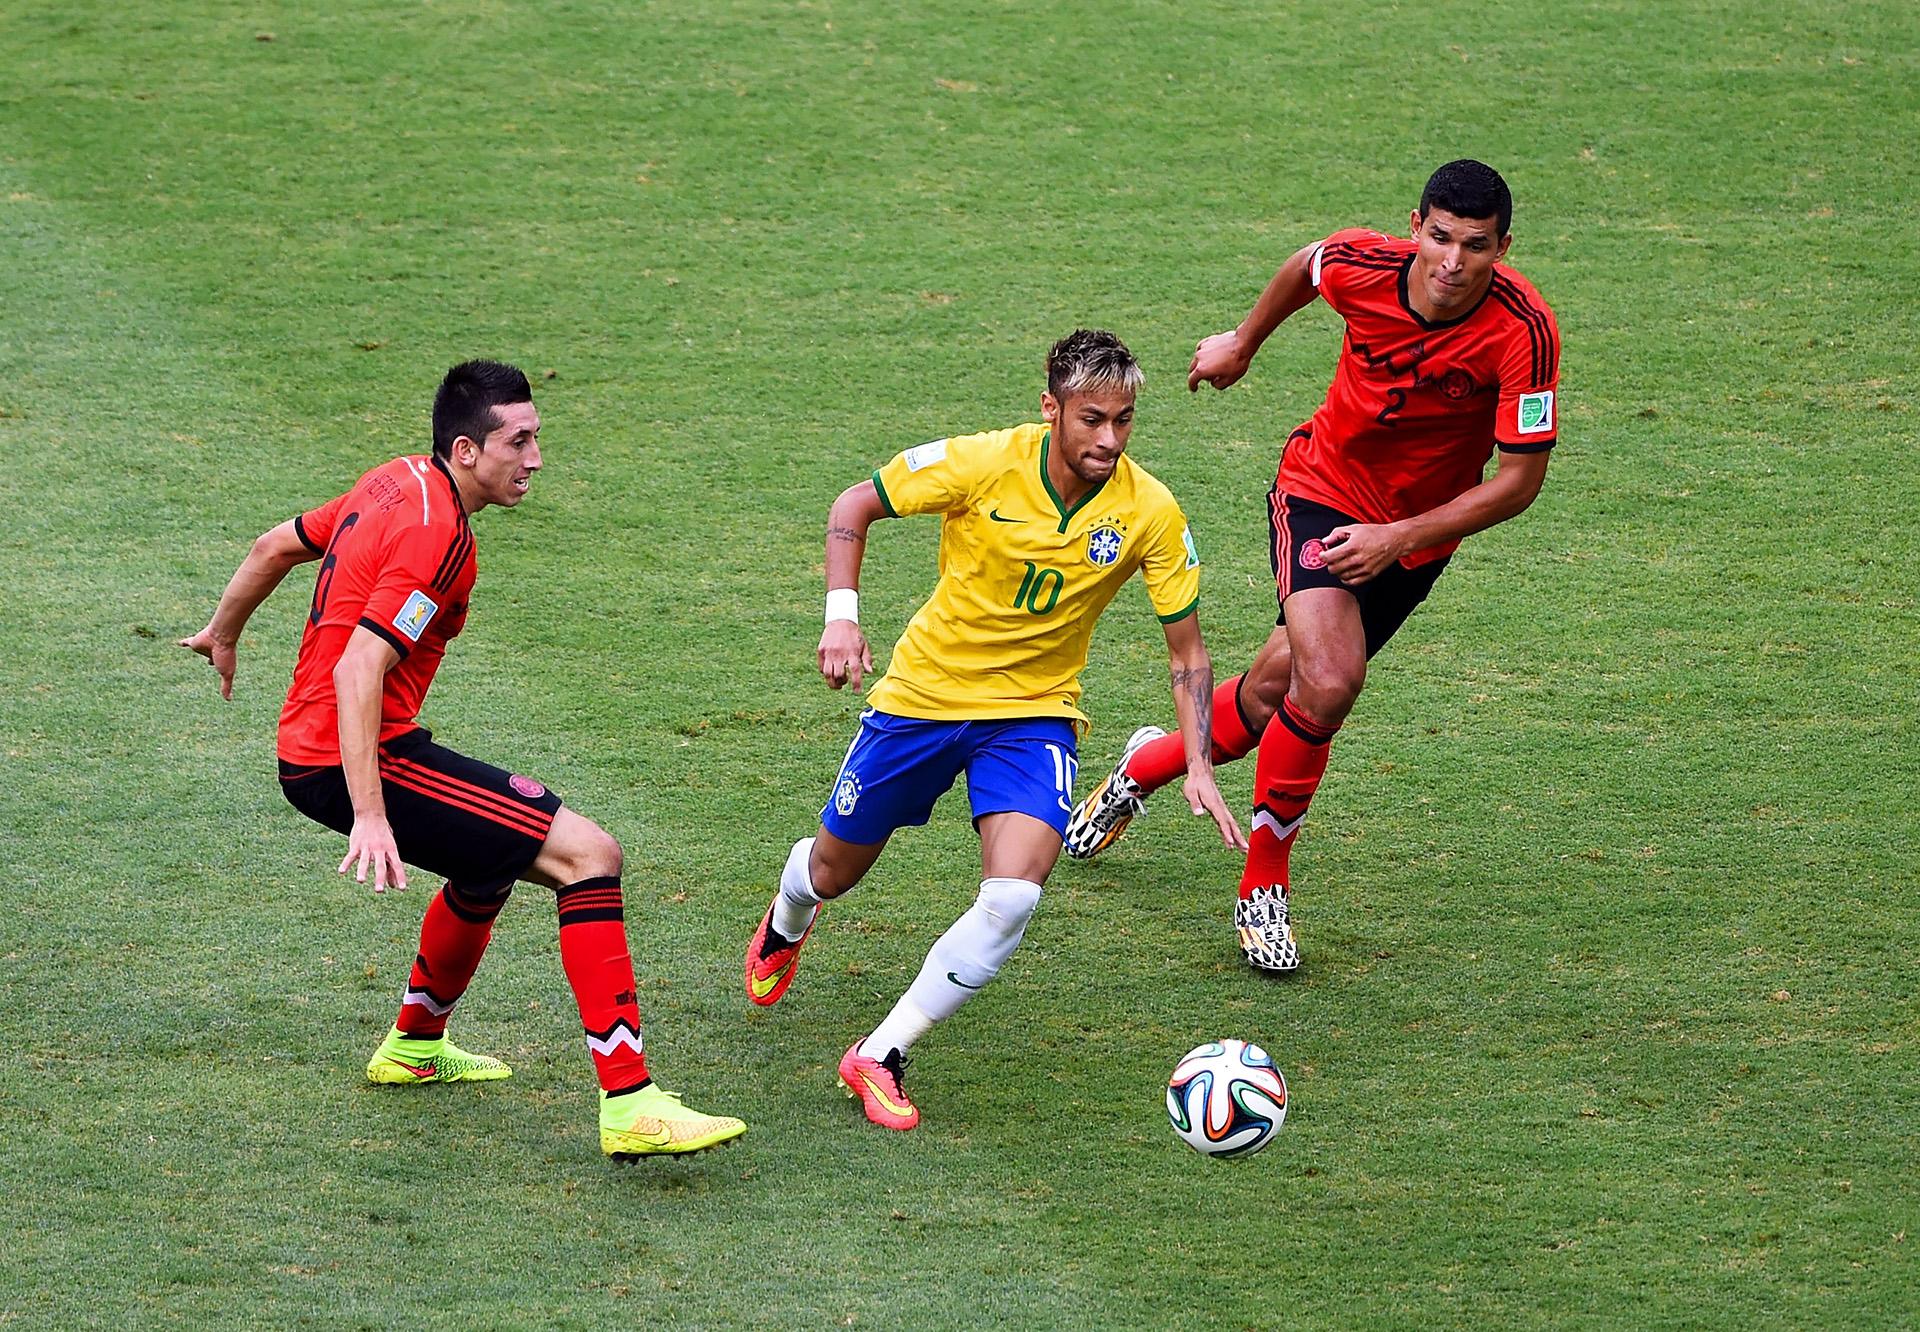 Neymar Brazil Francisco Rodriguez Hector Herrera Mexico 2014 World Cup Group A 06172014